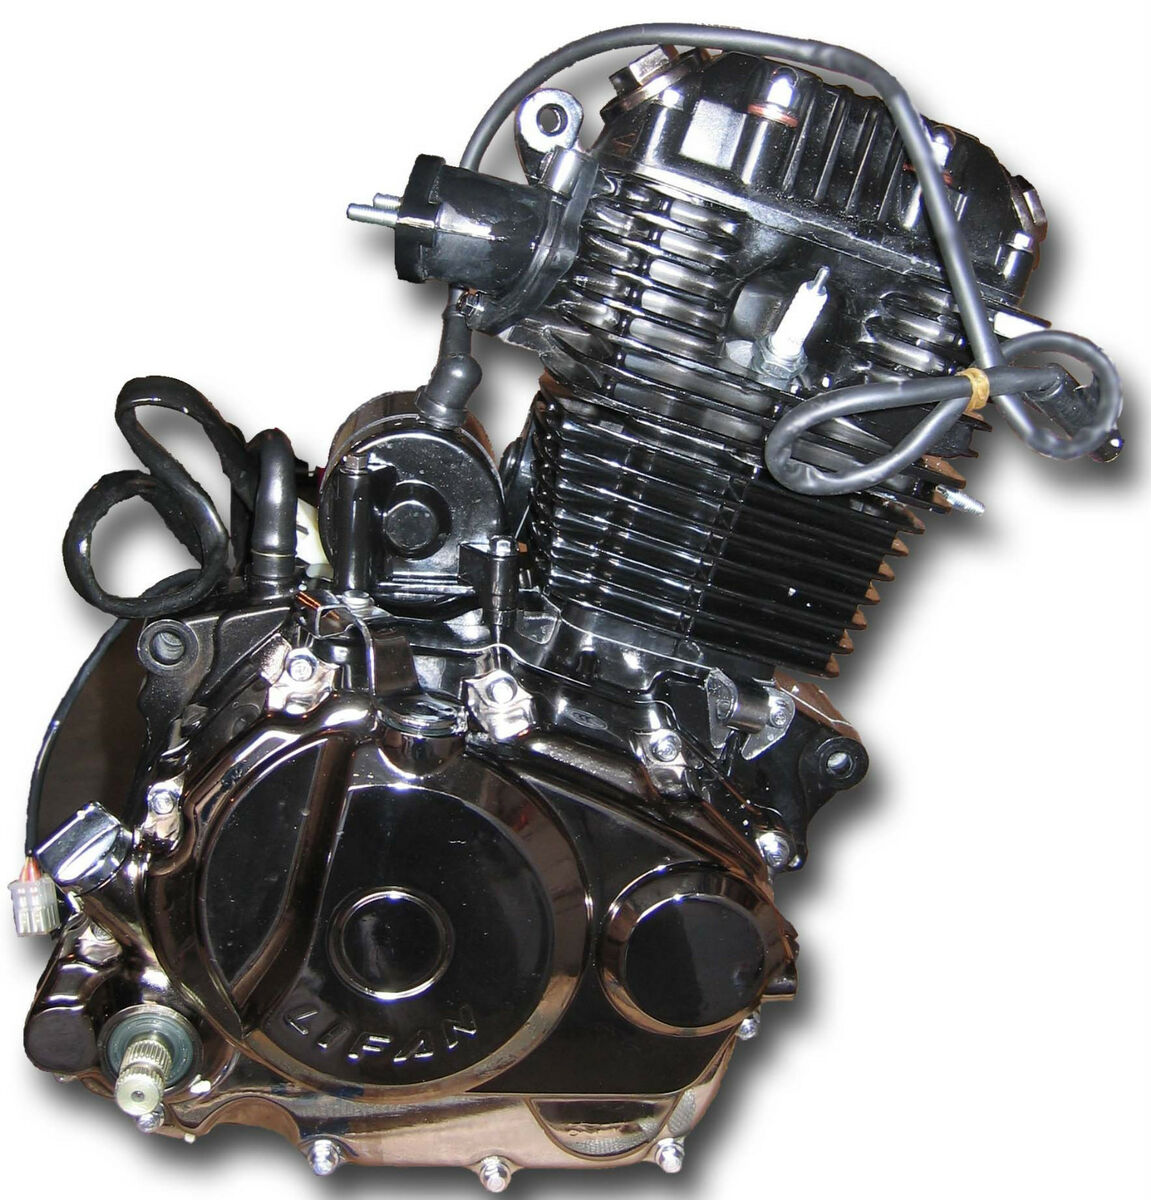 wiring diagram for kazuma meerkat 50cc atv baja 50cc atv